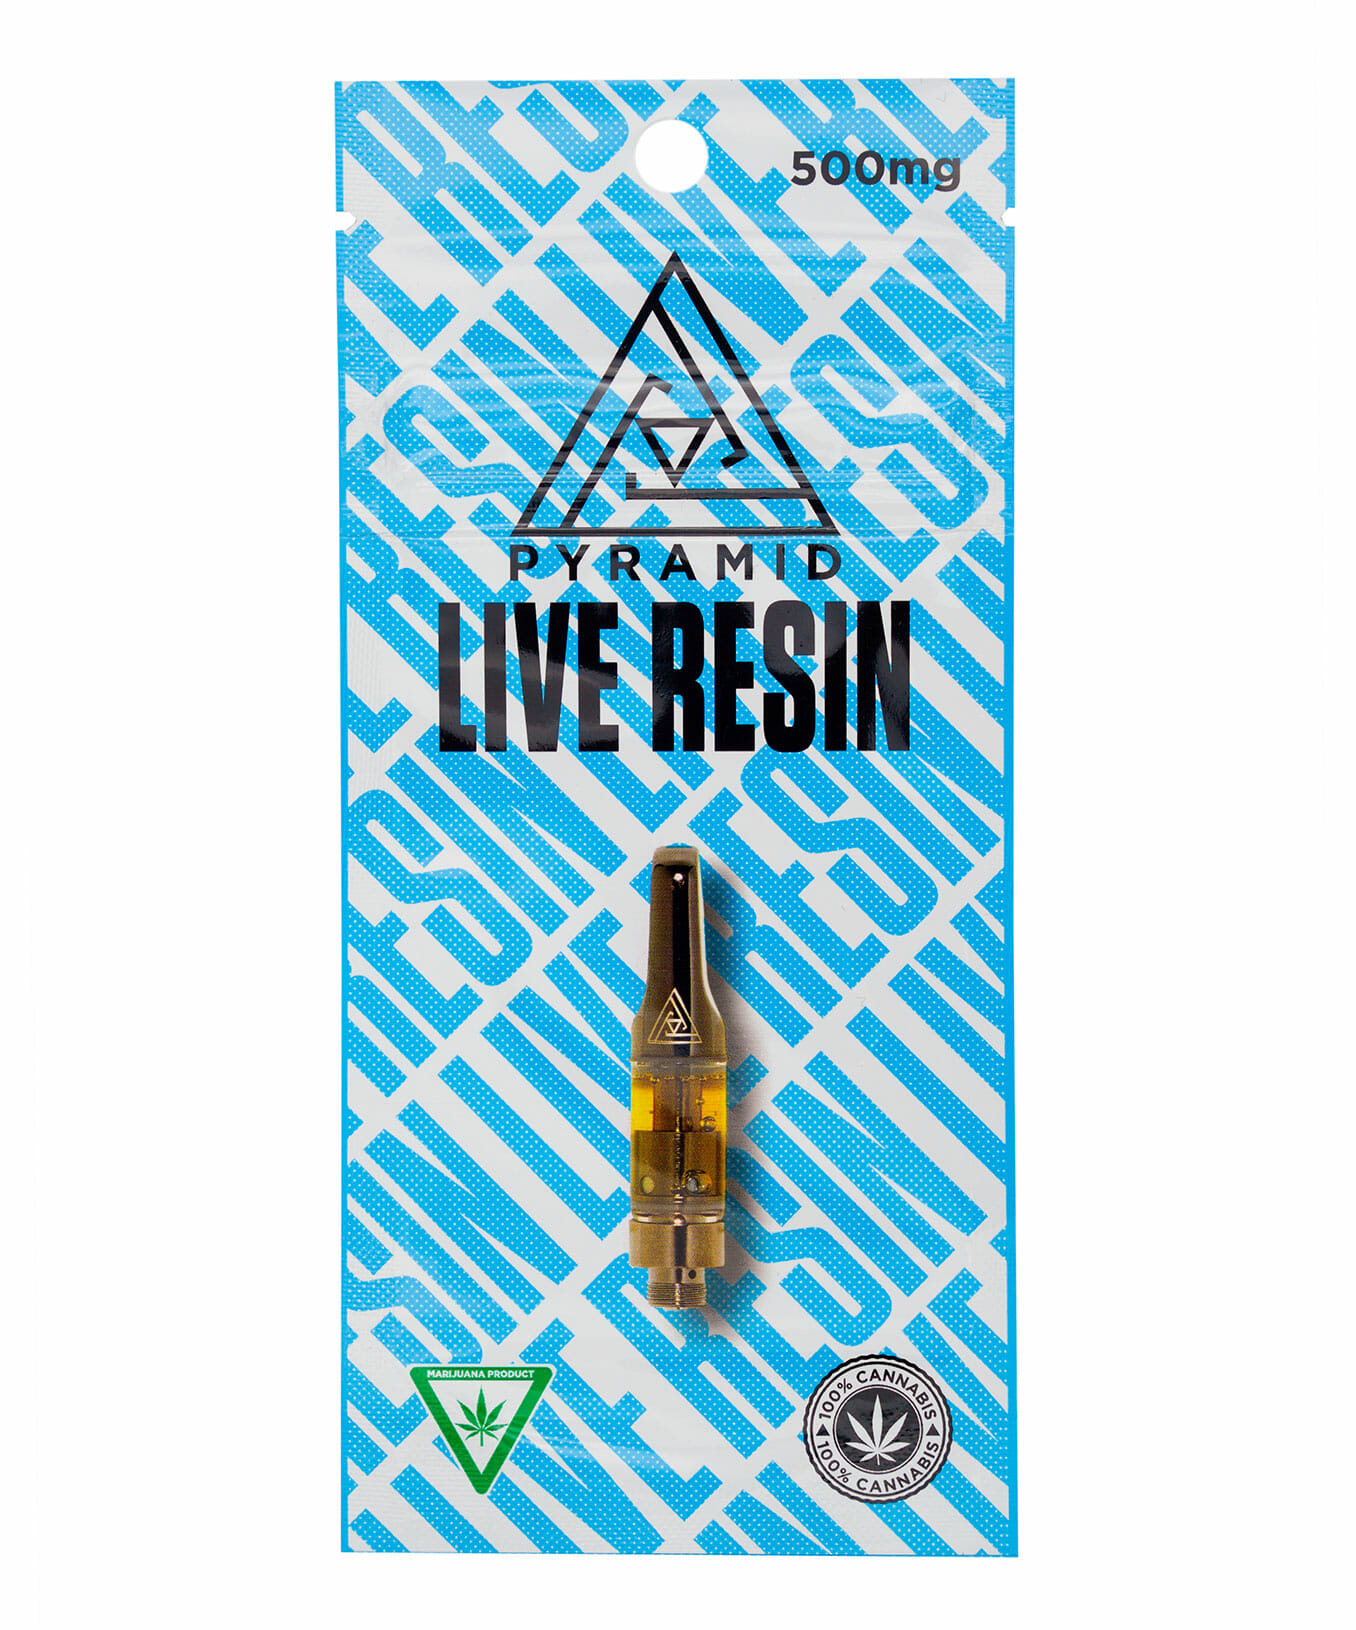 Pyramid Live Resin cartridges